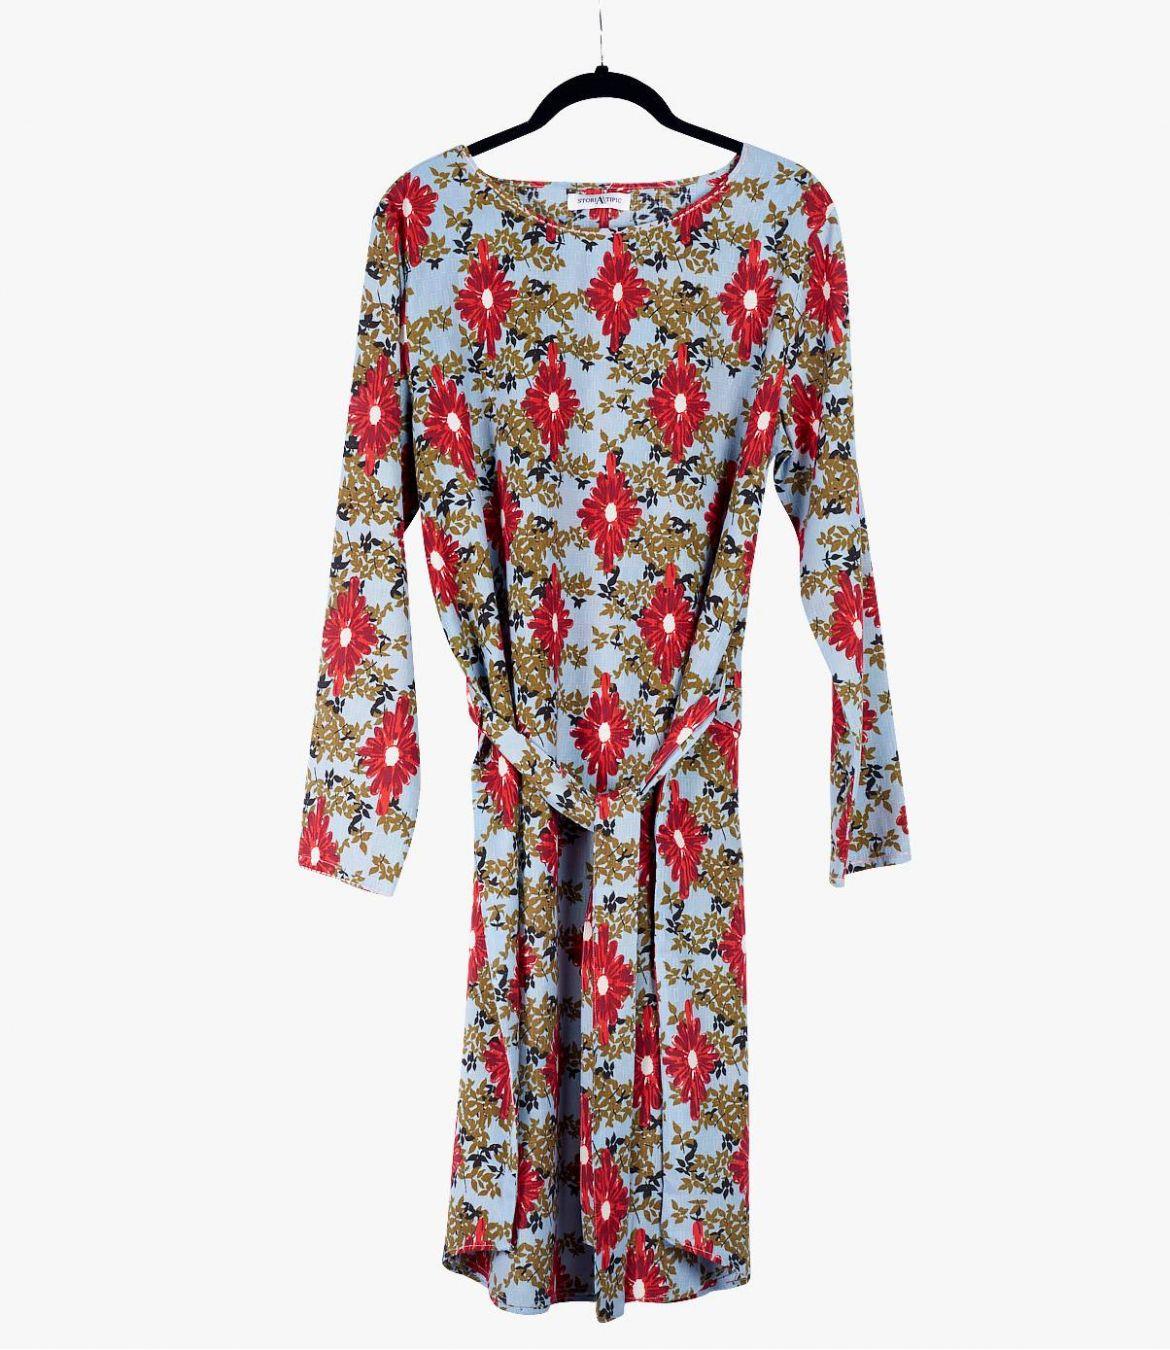 MARI ALEA Cotton Dress, Women's Modal Storiatipic - 2